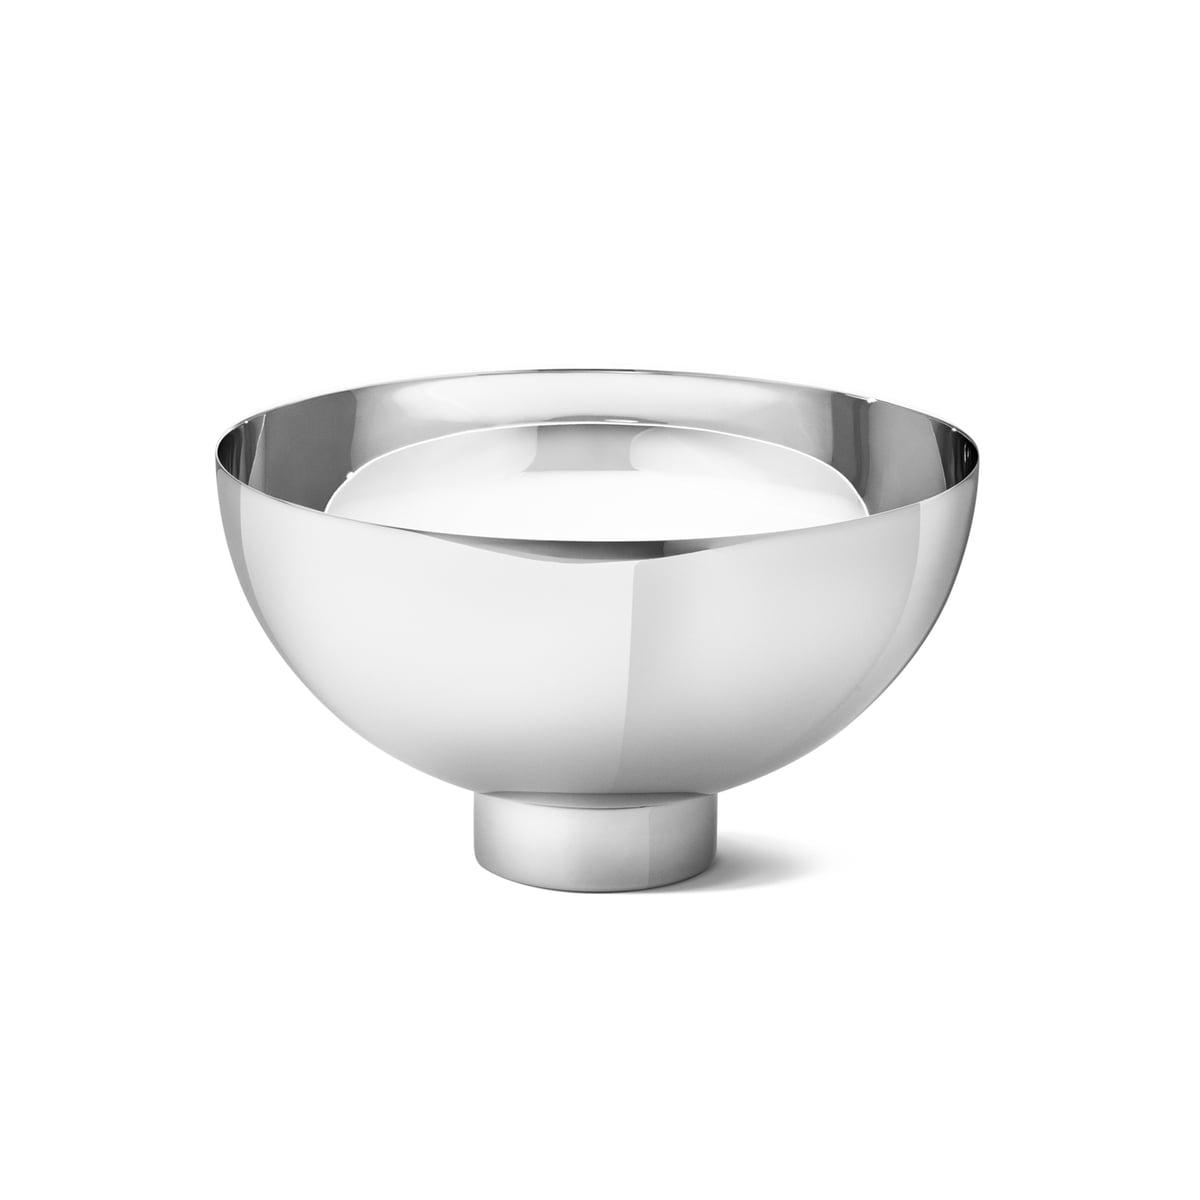 Edelstahl /Ø 27,5cm Holz Georg Jensen Soeren Schale//Bowl